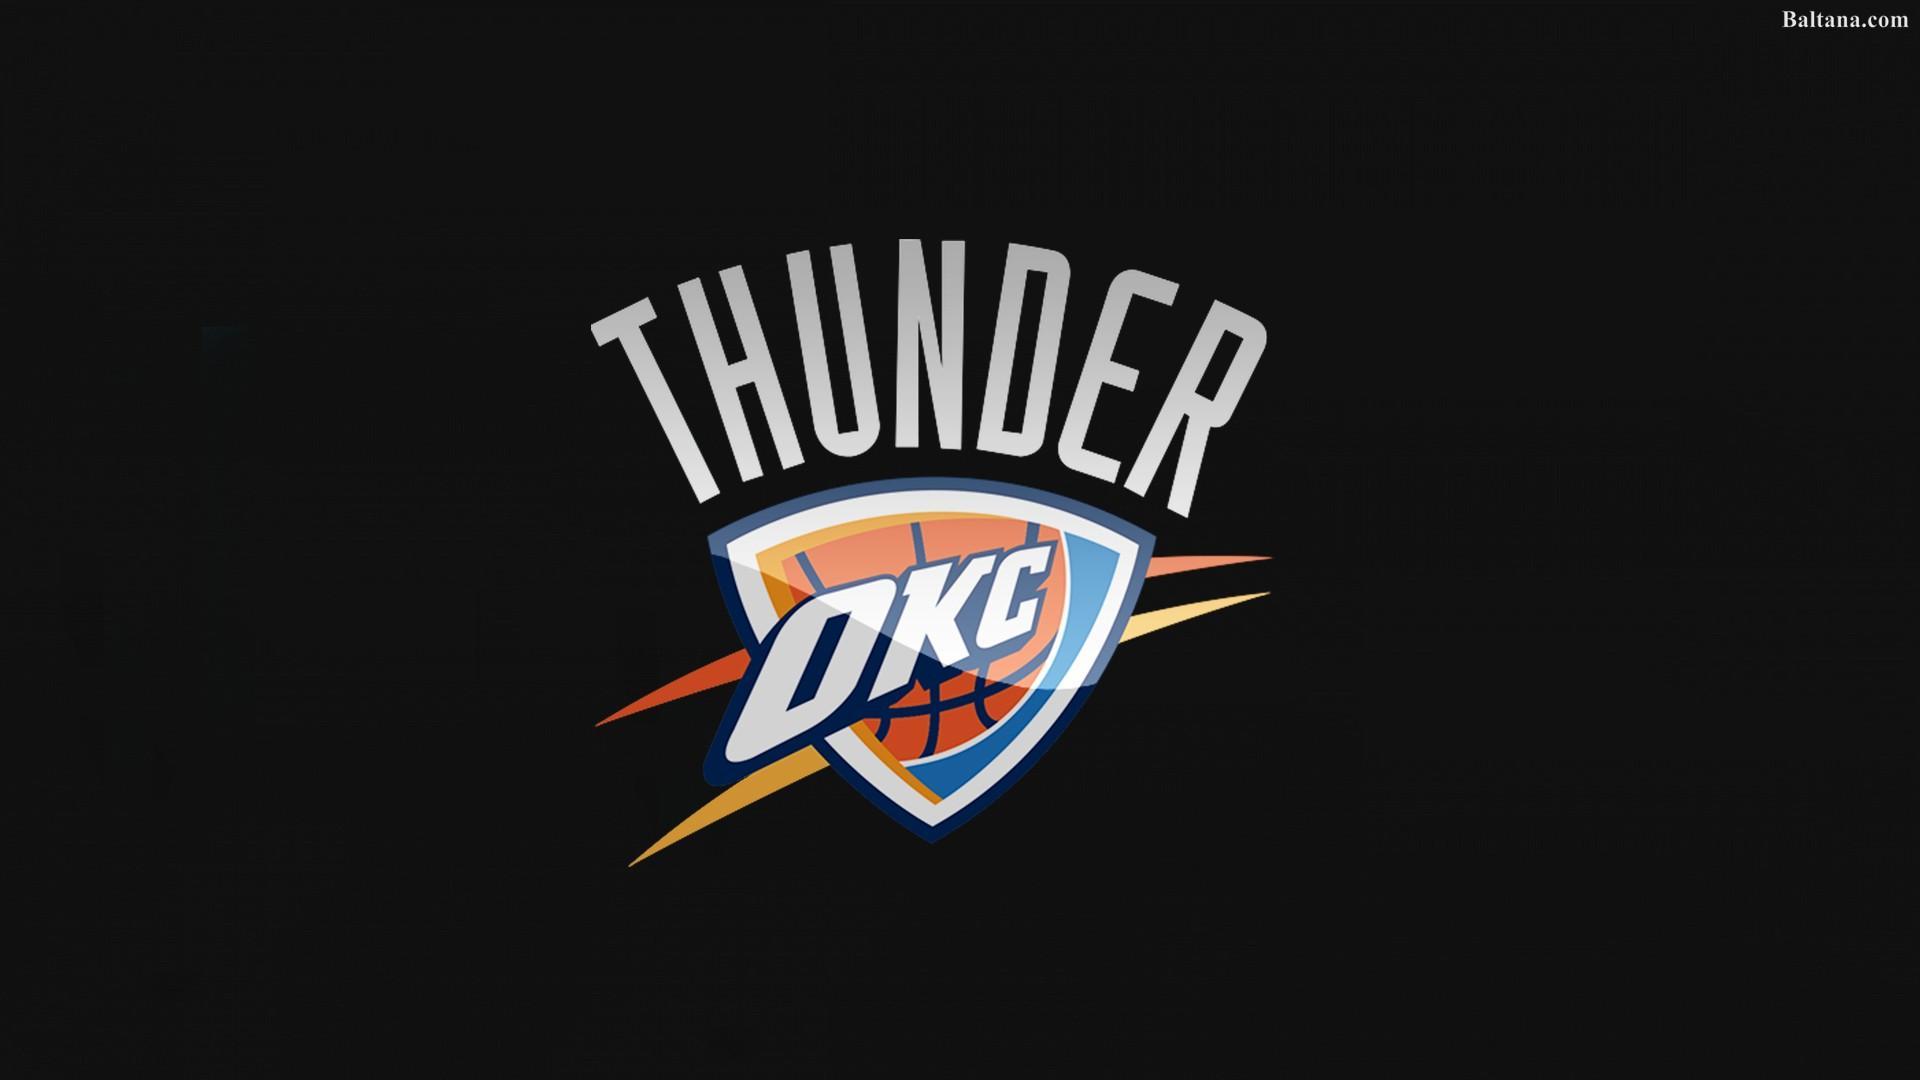 Oklahoma City Thunder 2019 Wallpapers - Wallpaper Cave